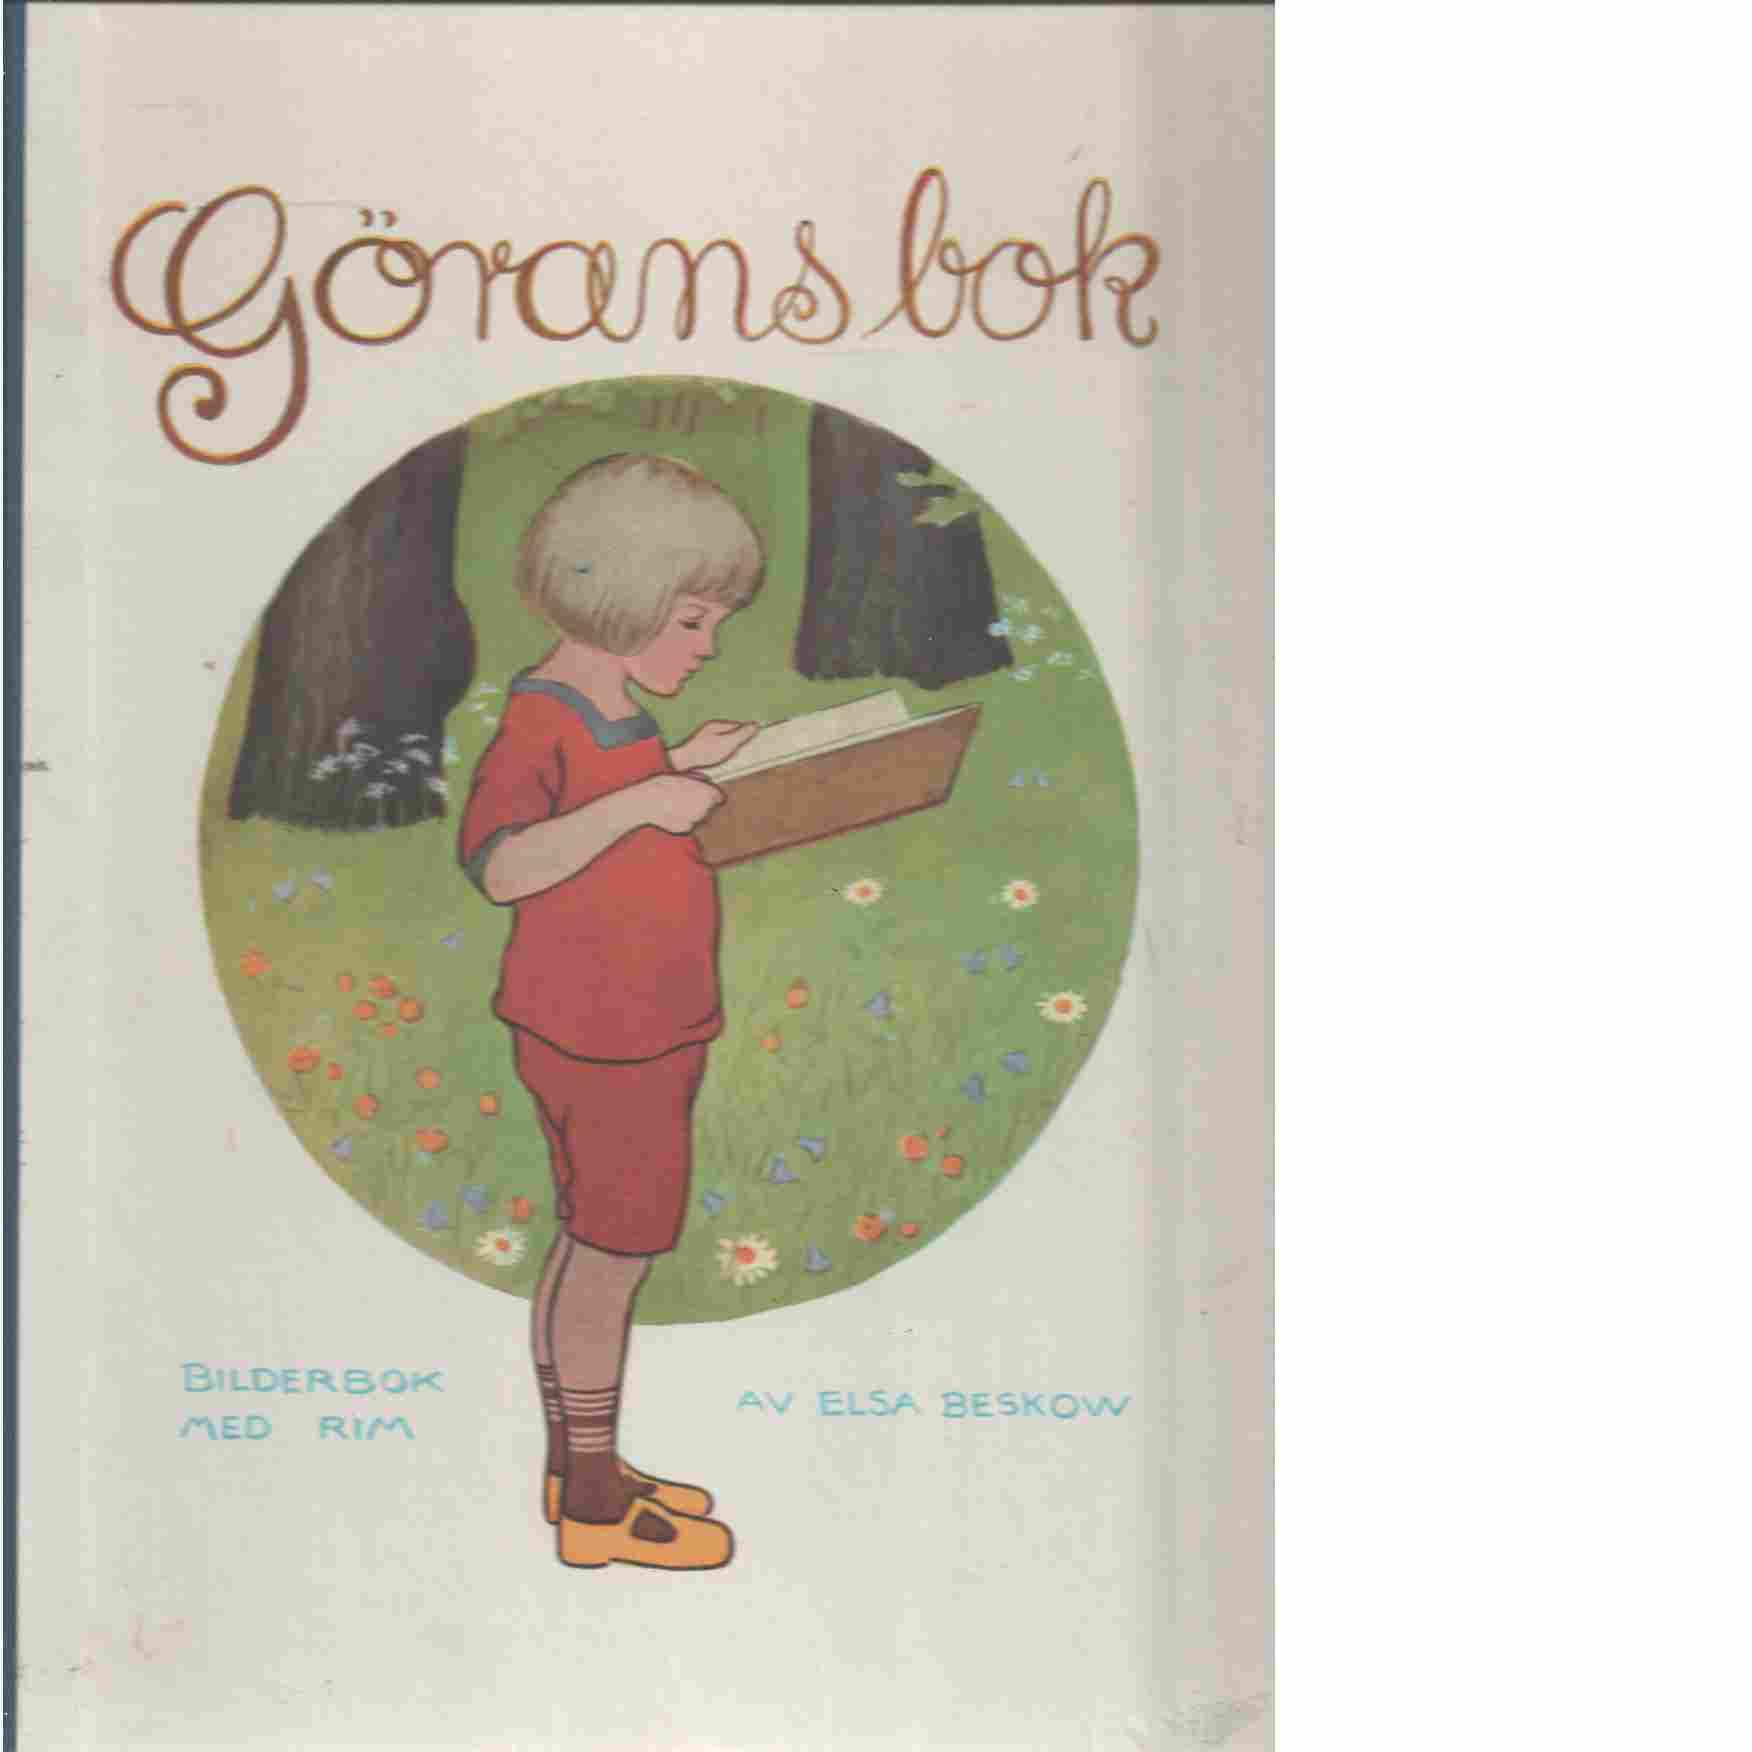 Görans bok : bilderbok med rim - Beskow, Elsa